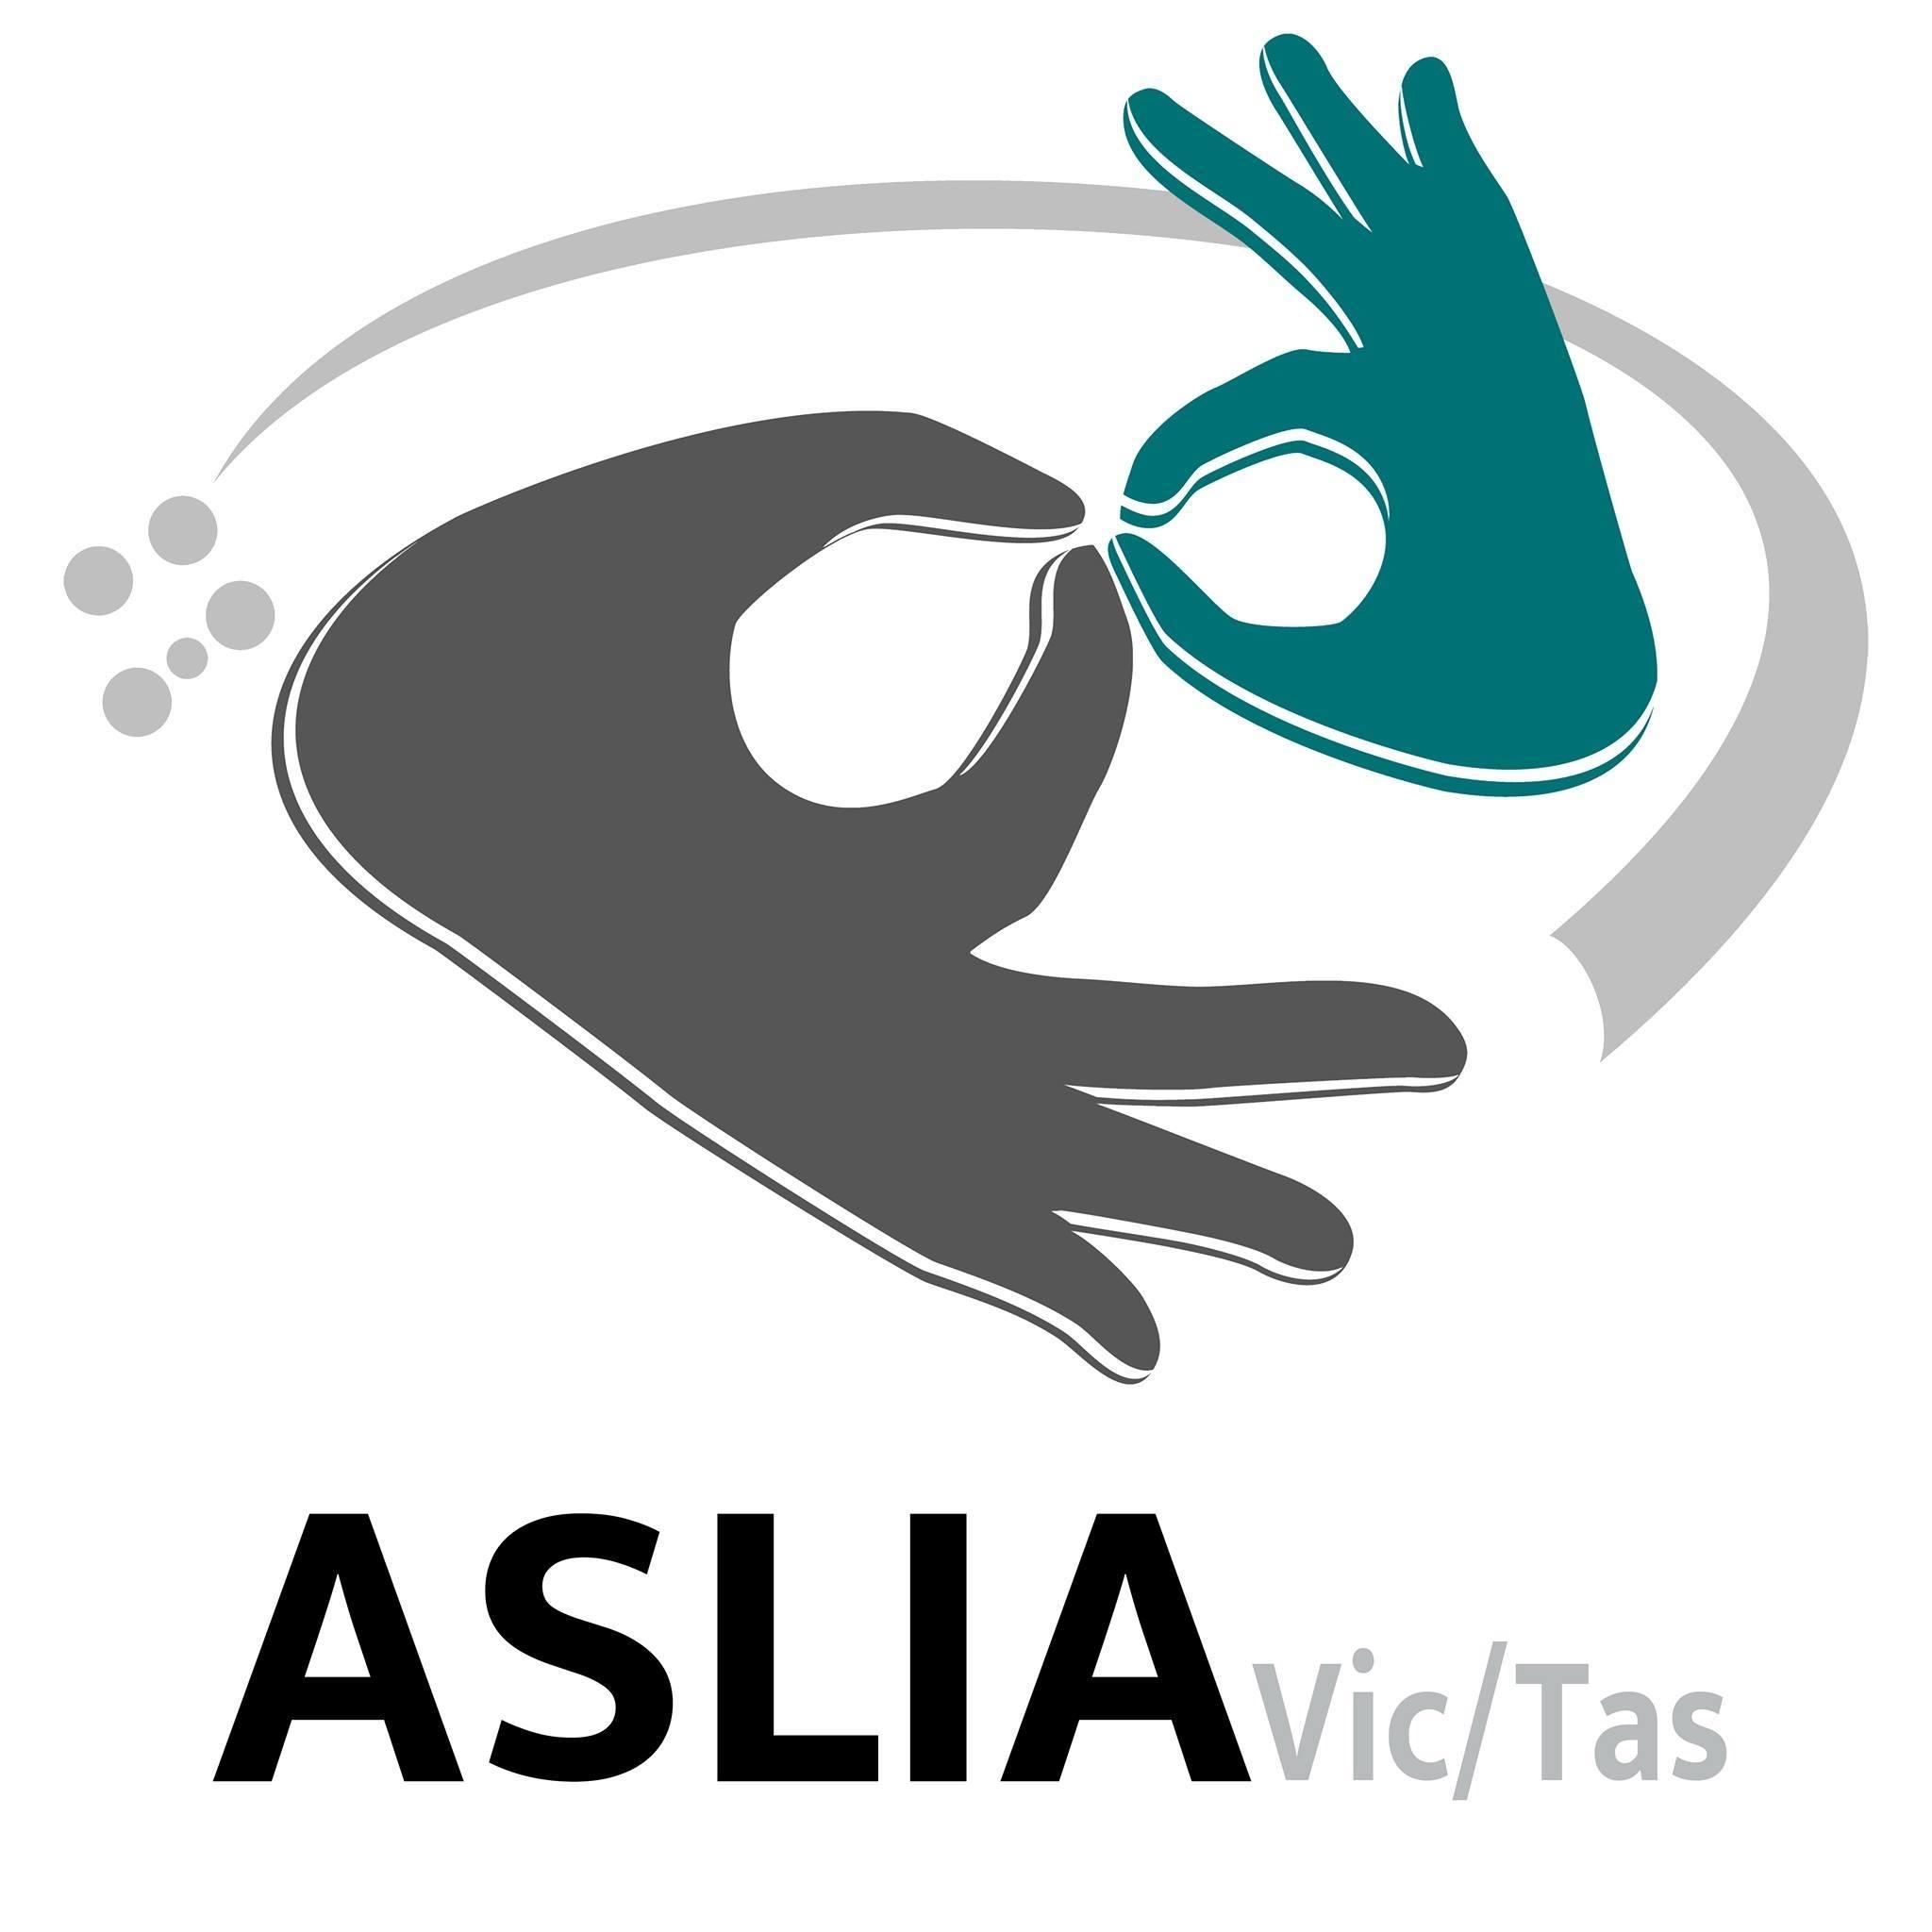 ASLIA Vic/Tas: November General Meeting